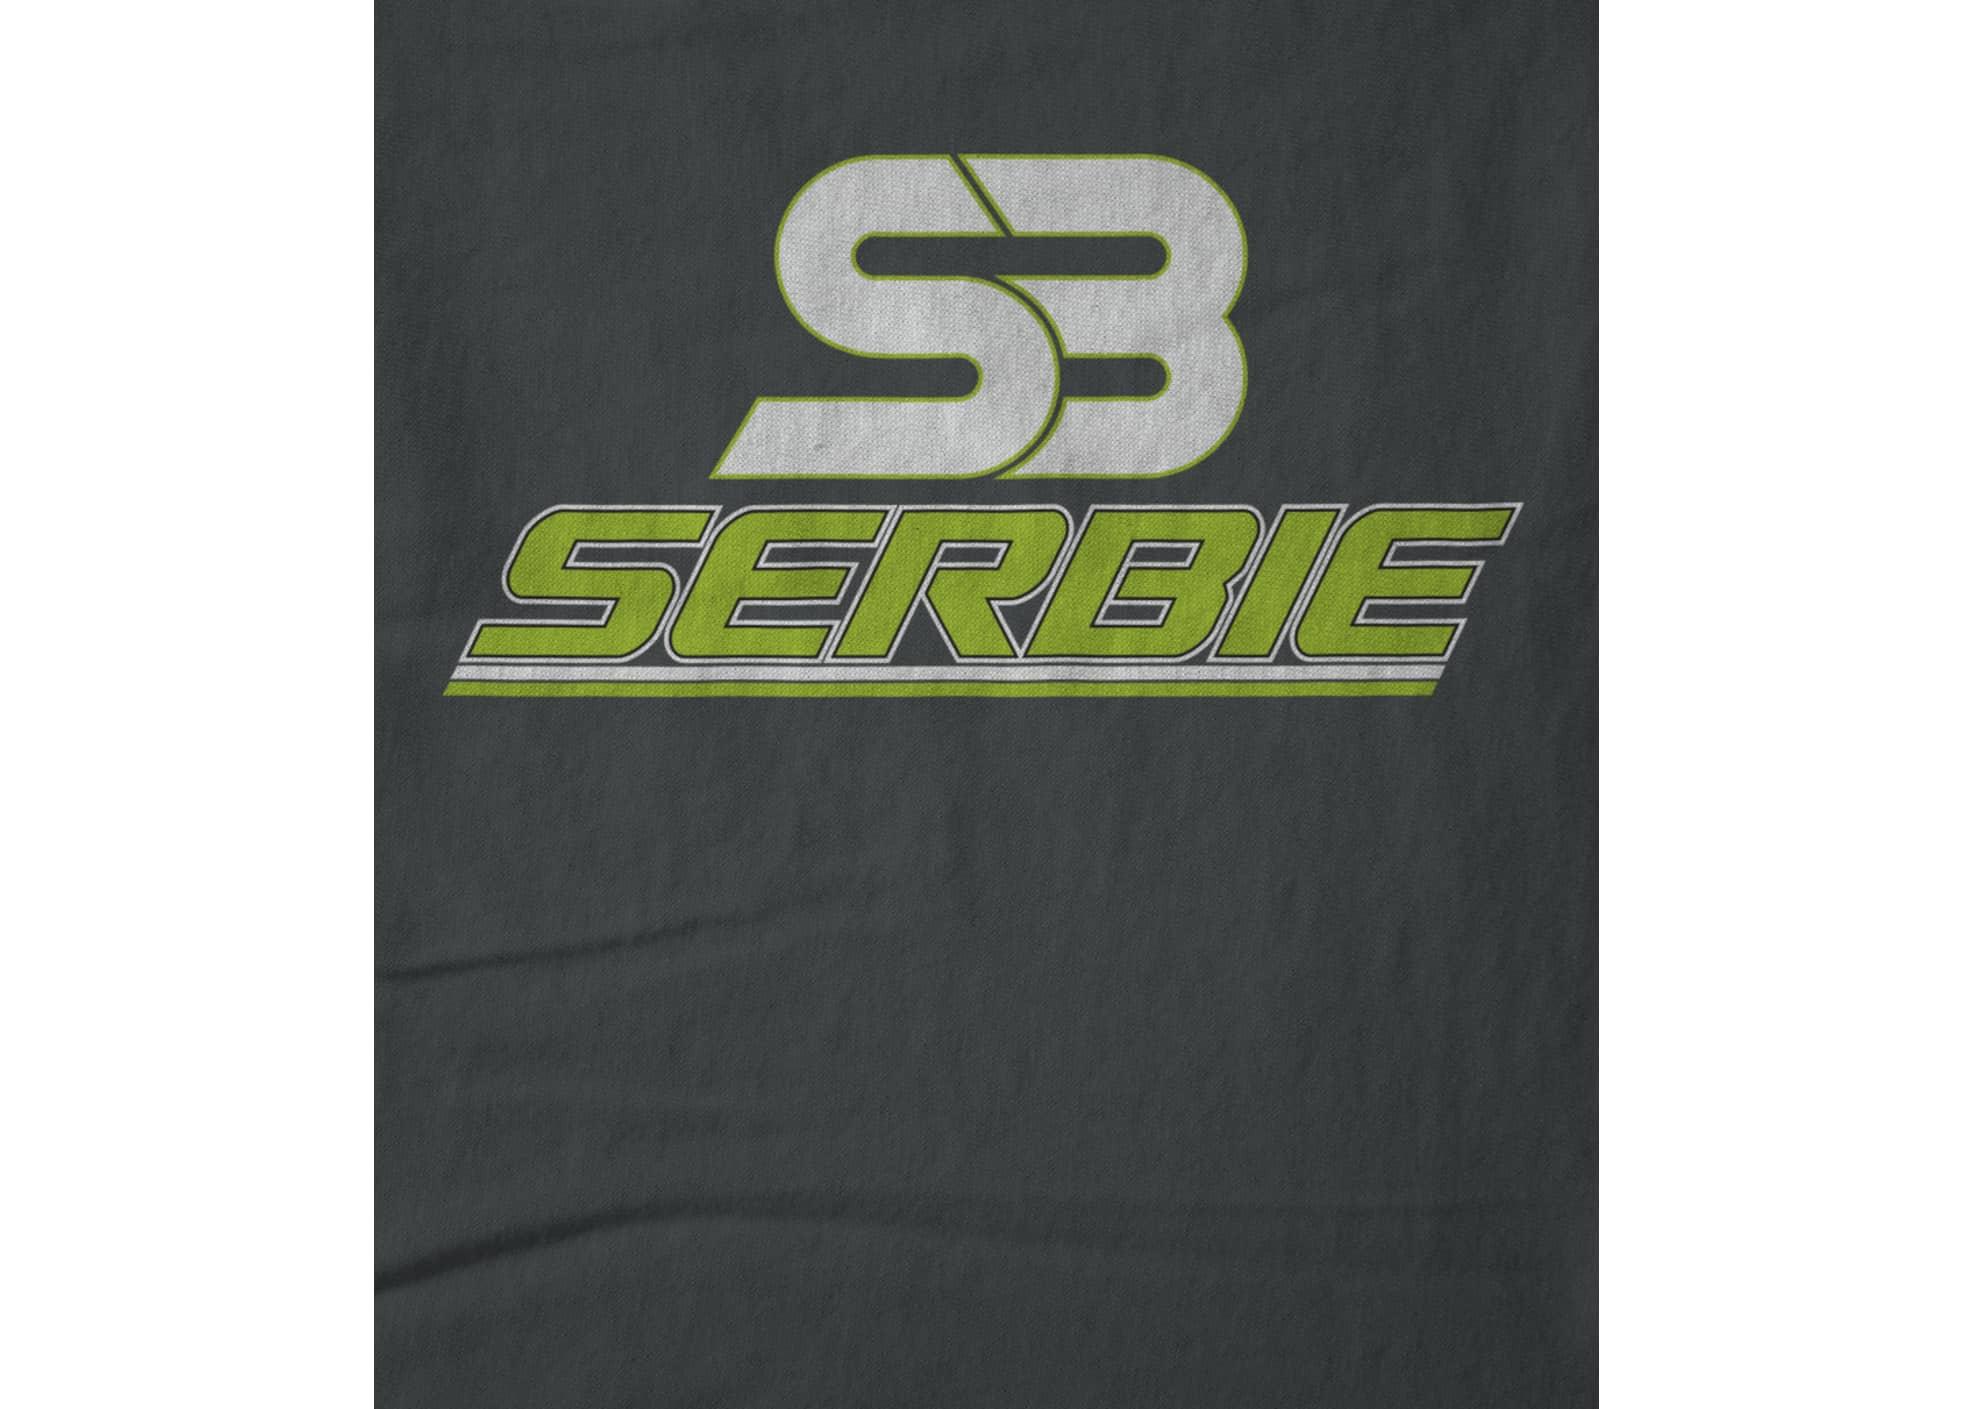 Serbie serbielogo8 1592801790